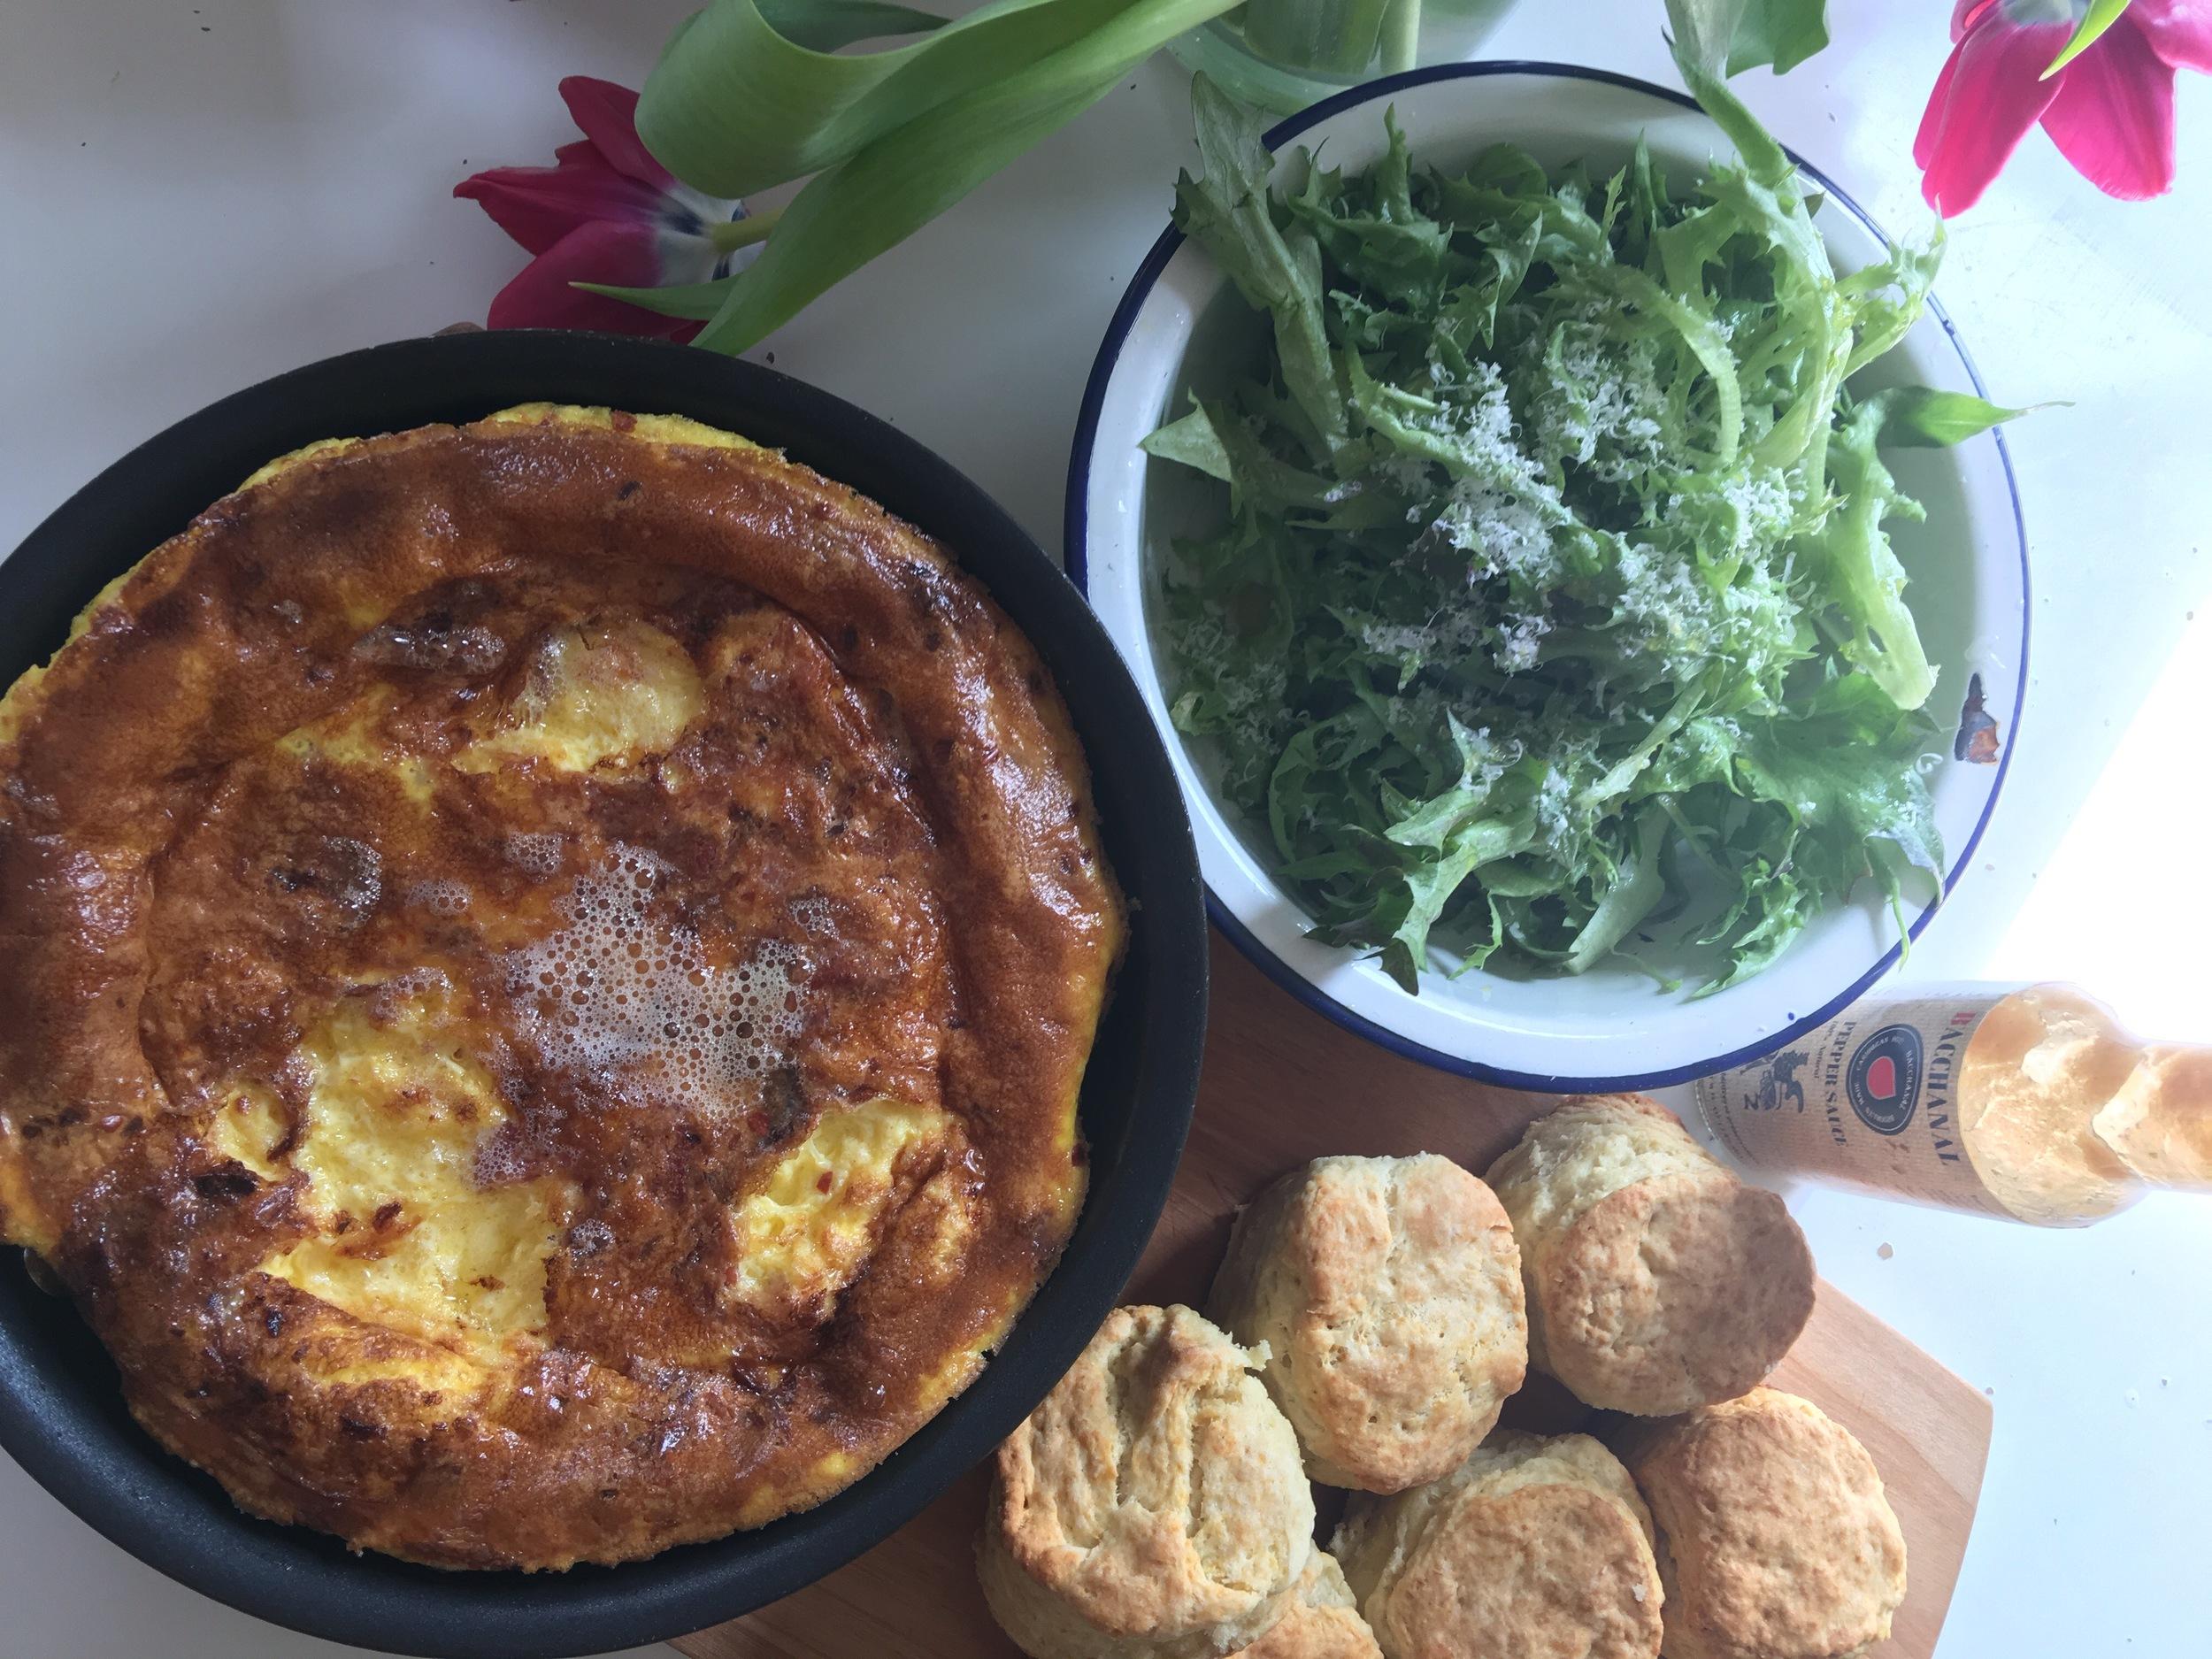 Nicole's last make:Veggie frittata, greens, and biscuits.